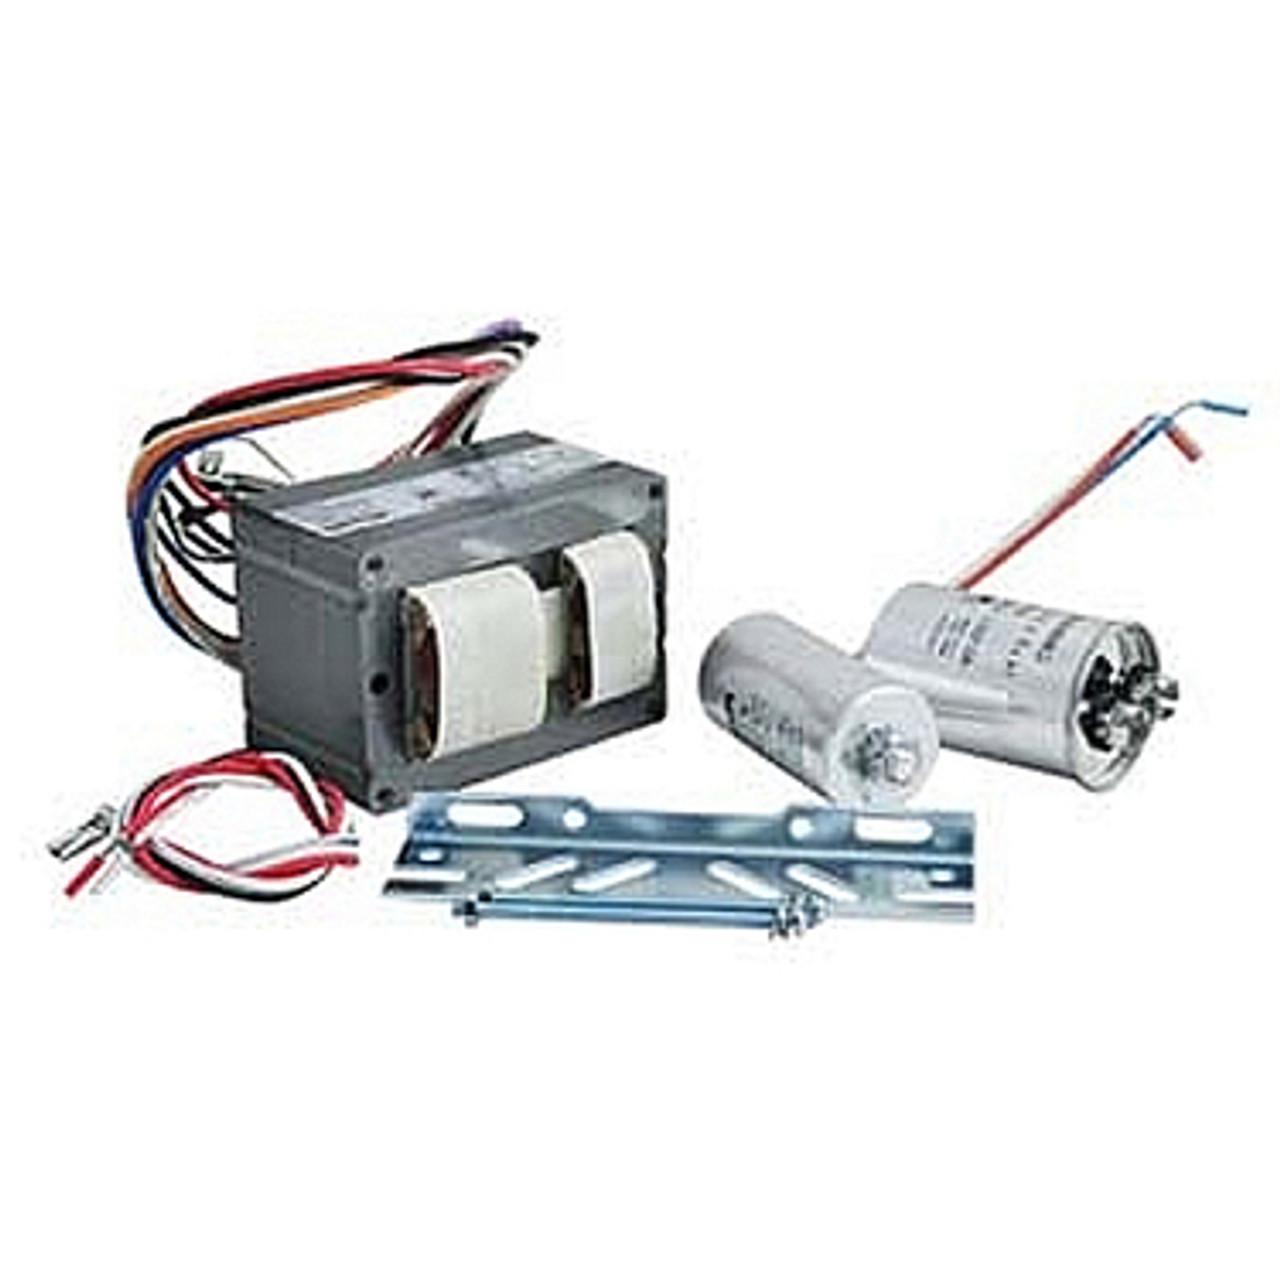 240 Volt Photocell Wiring Diagram In Addition 277 Volt Ballast Wiring